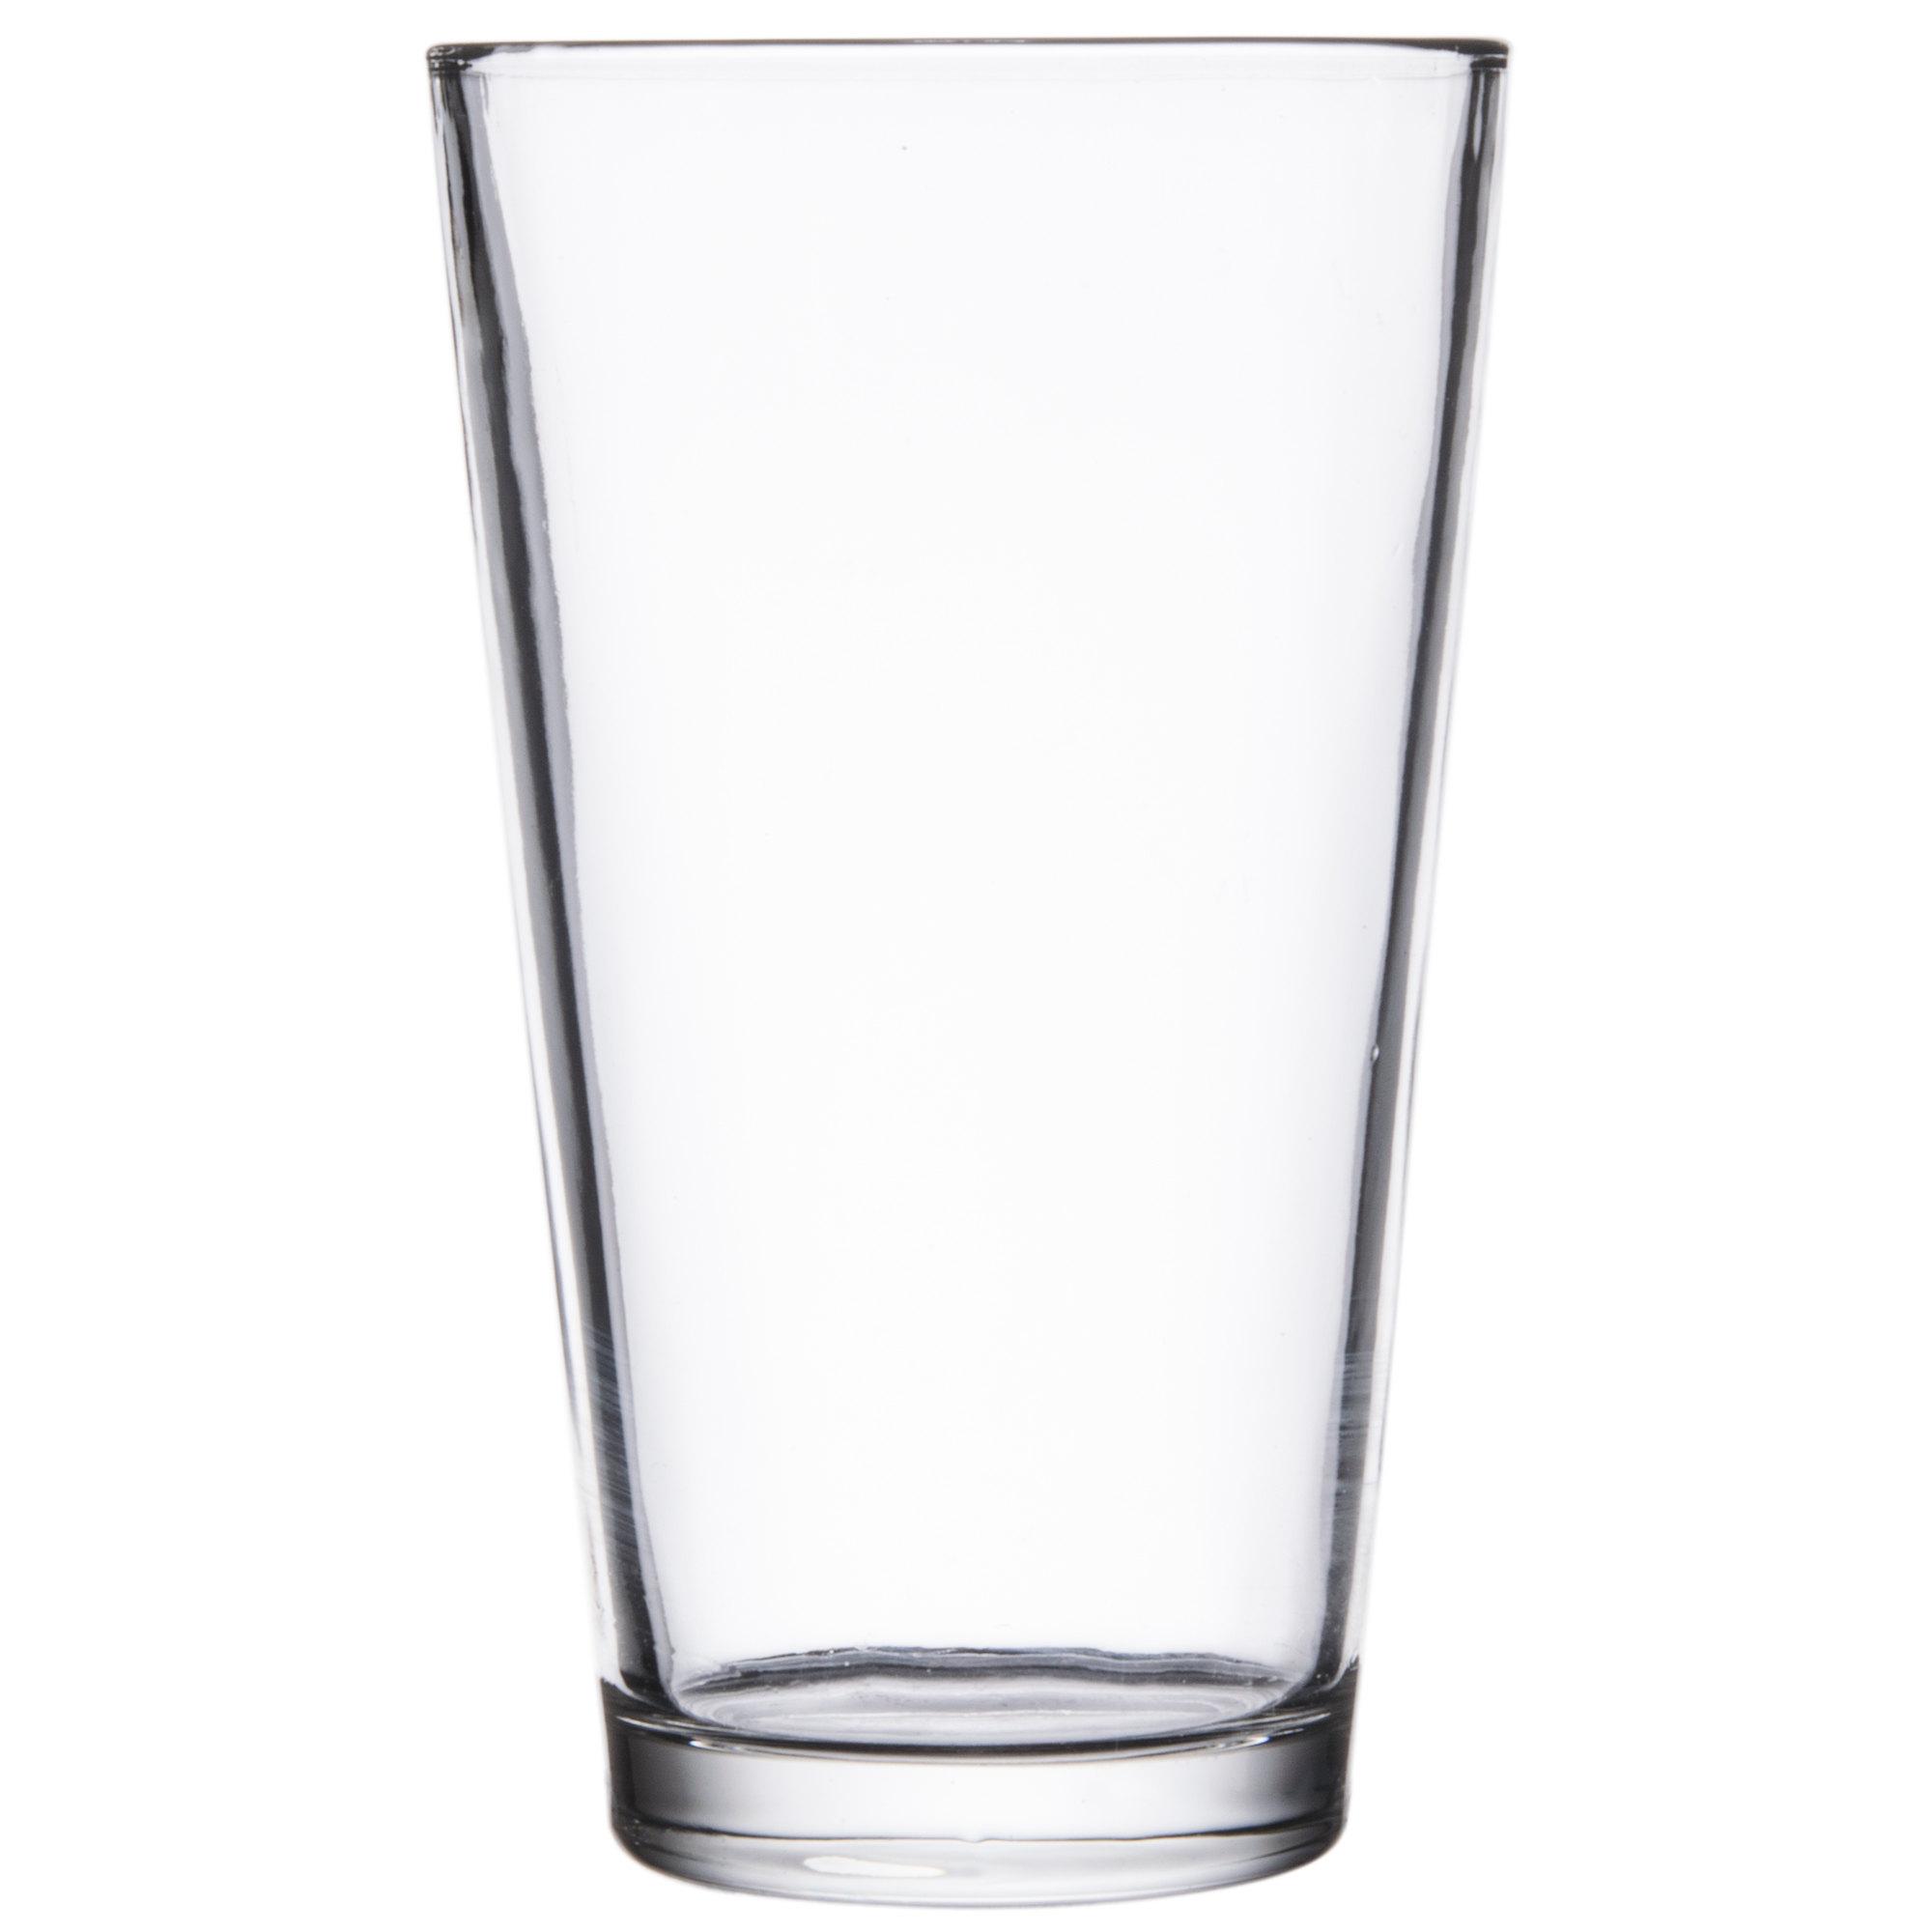 Aerial Glasses